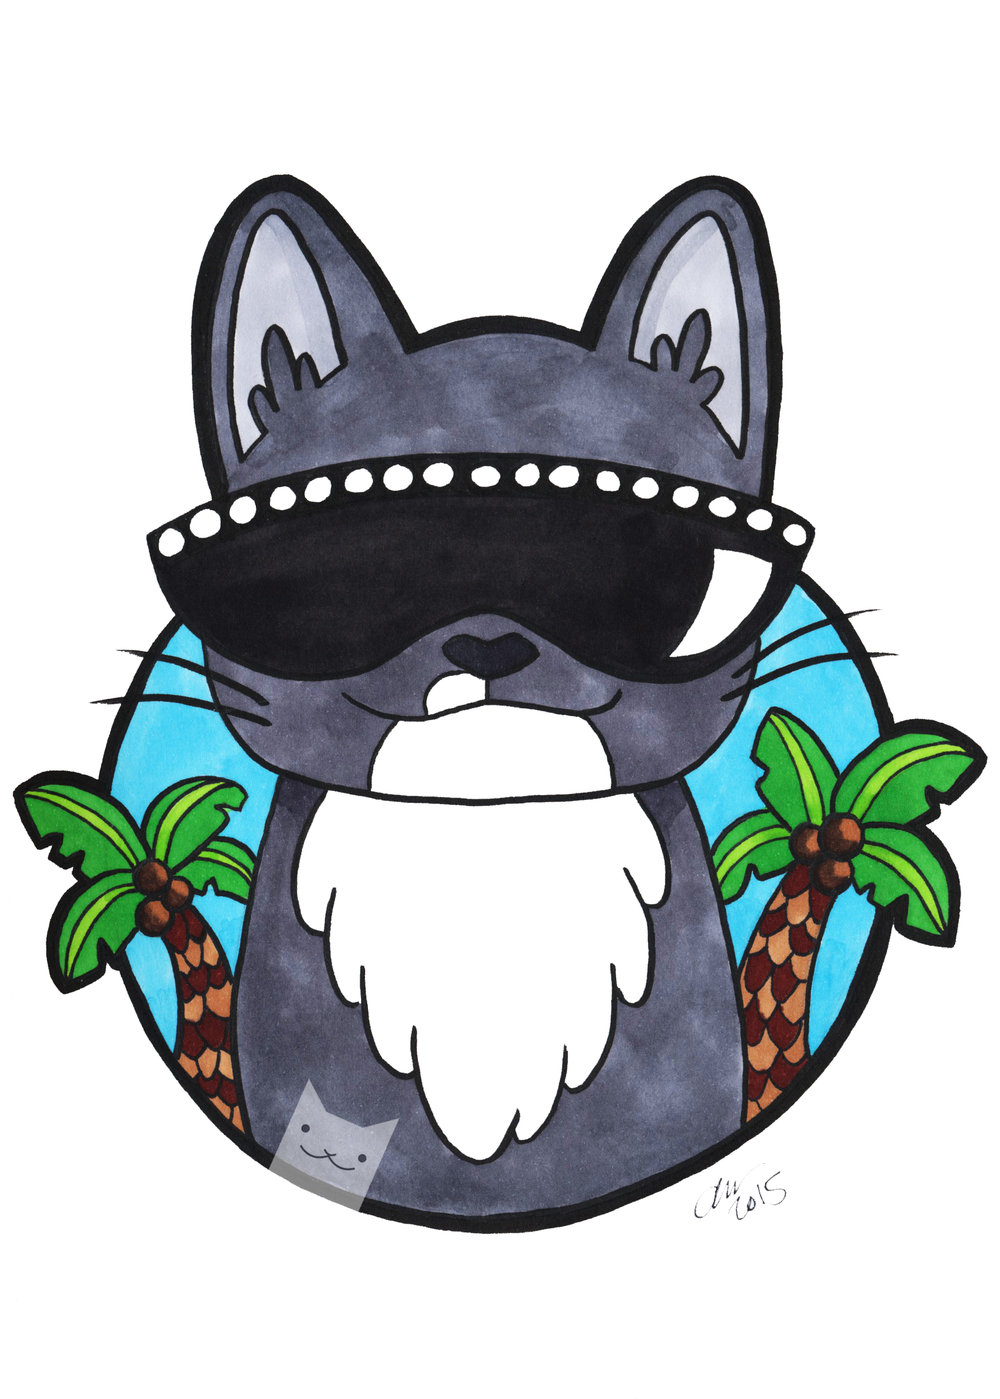 sunglass cat.jpg